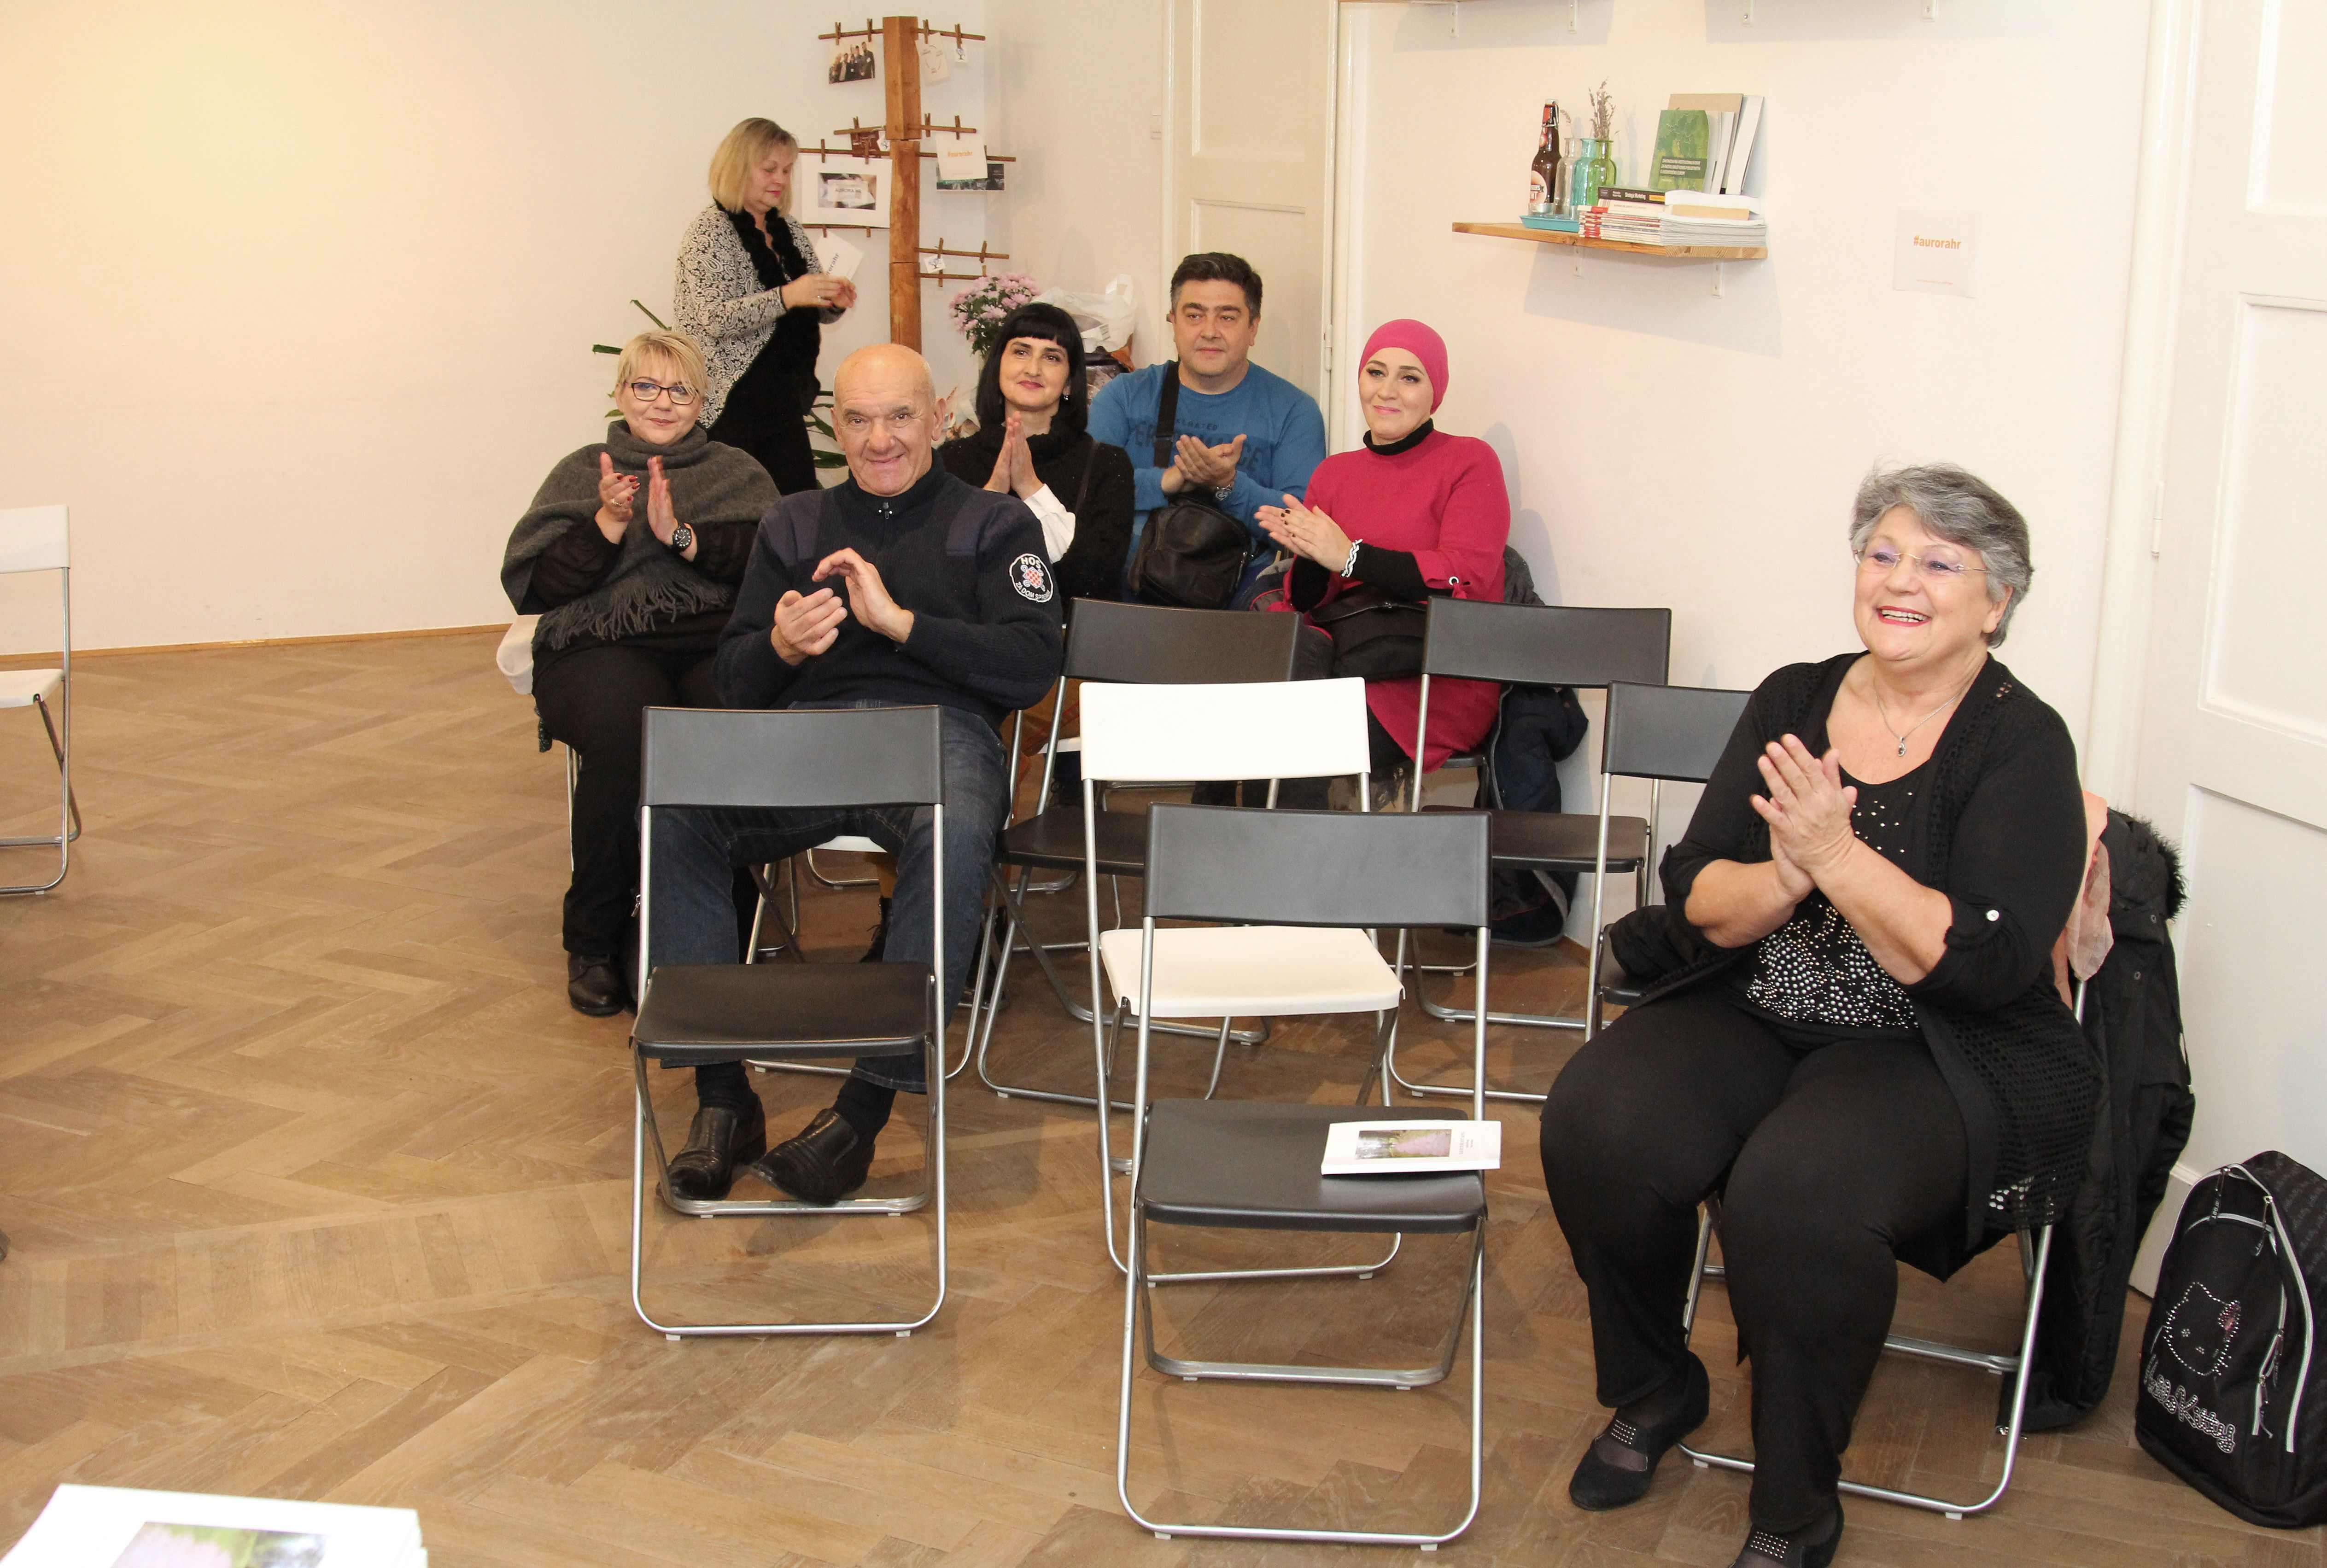 Predstavljanje knjige Nada Landeka Emilija Herceg - publika